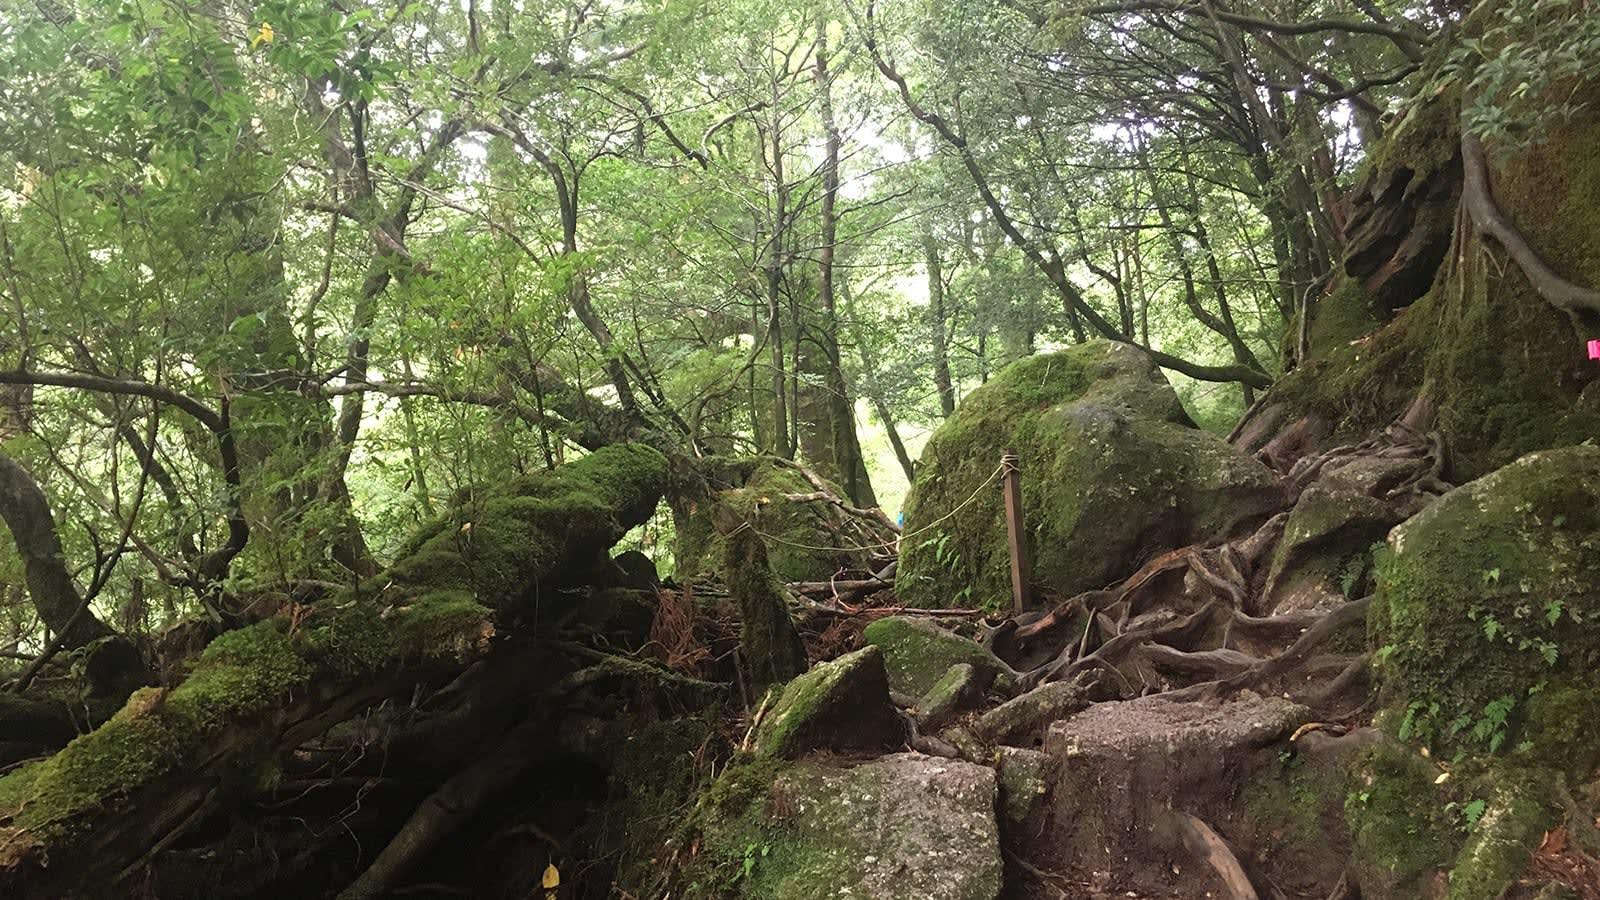 du lịch yakushima - rừng nguyên sinh